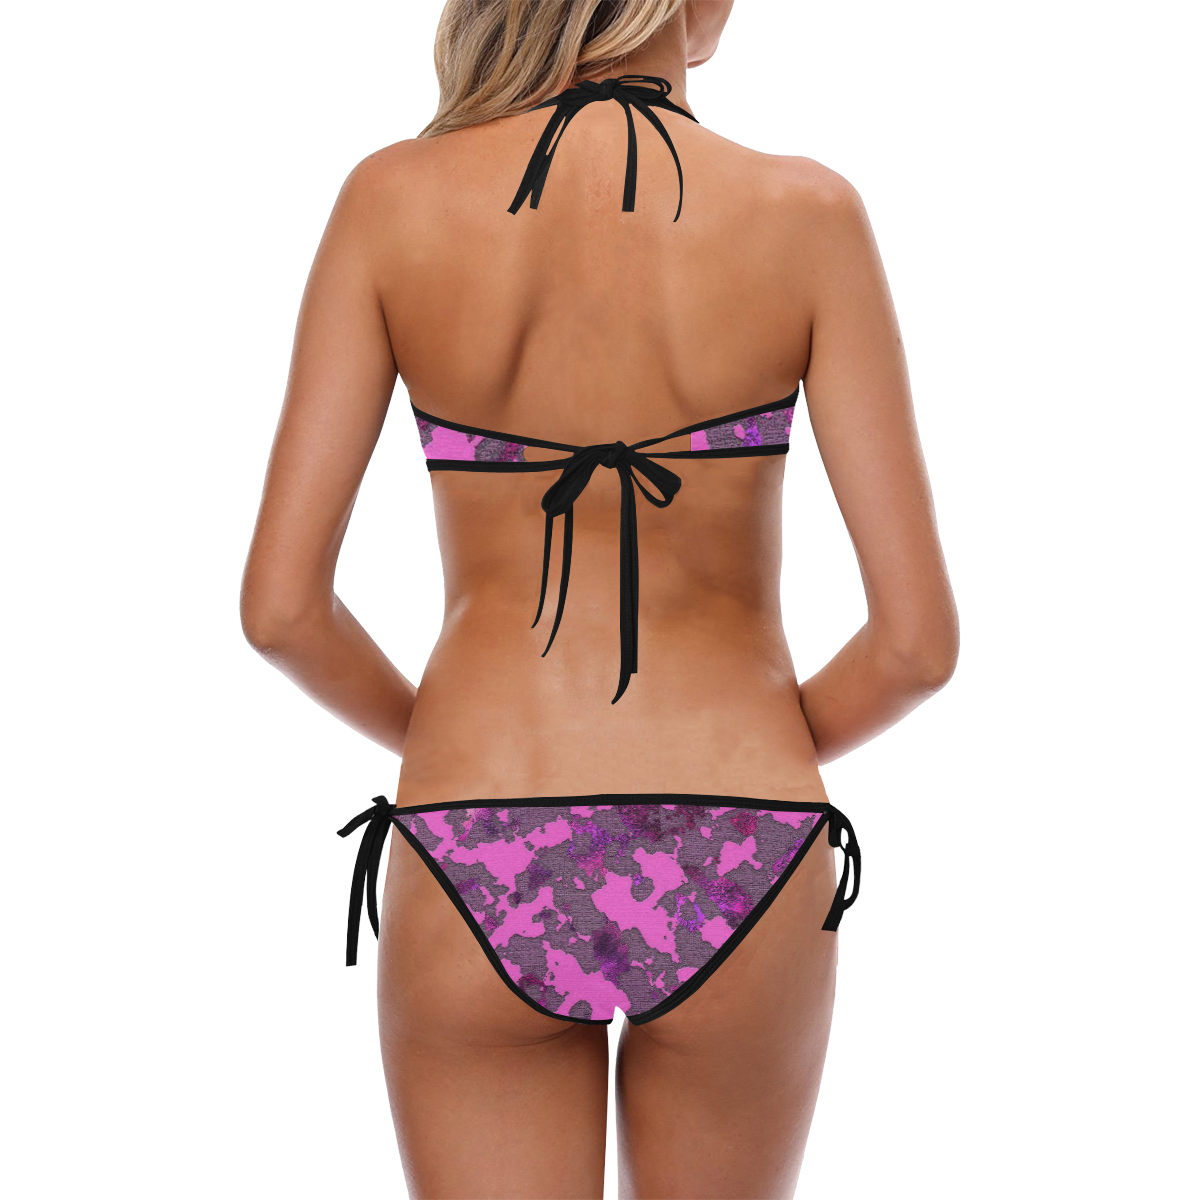 CAMOUFLAGE PINK BLACK Custom Halter & Side Tie Bikini Swimsuit (Model S06)